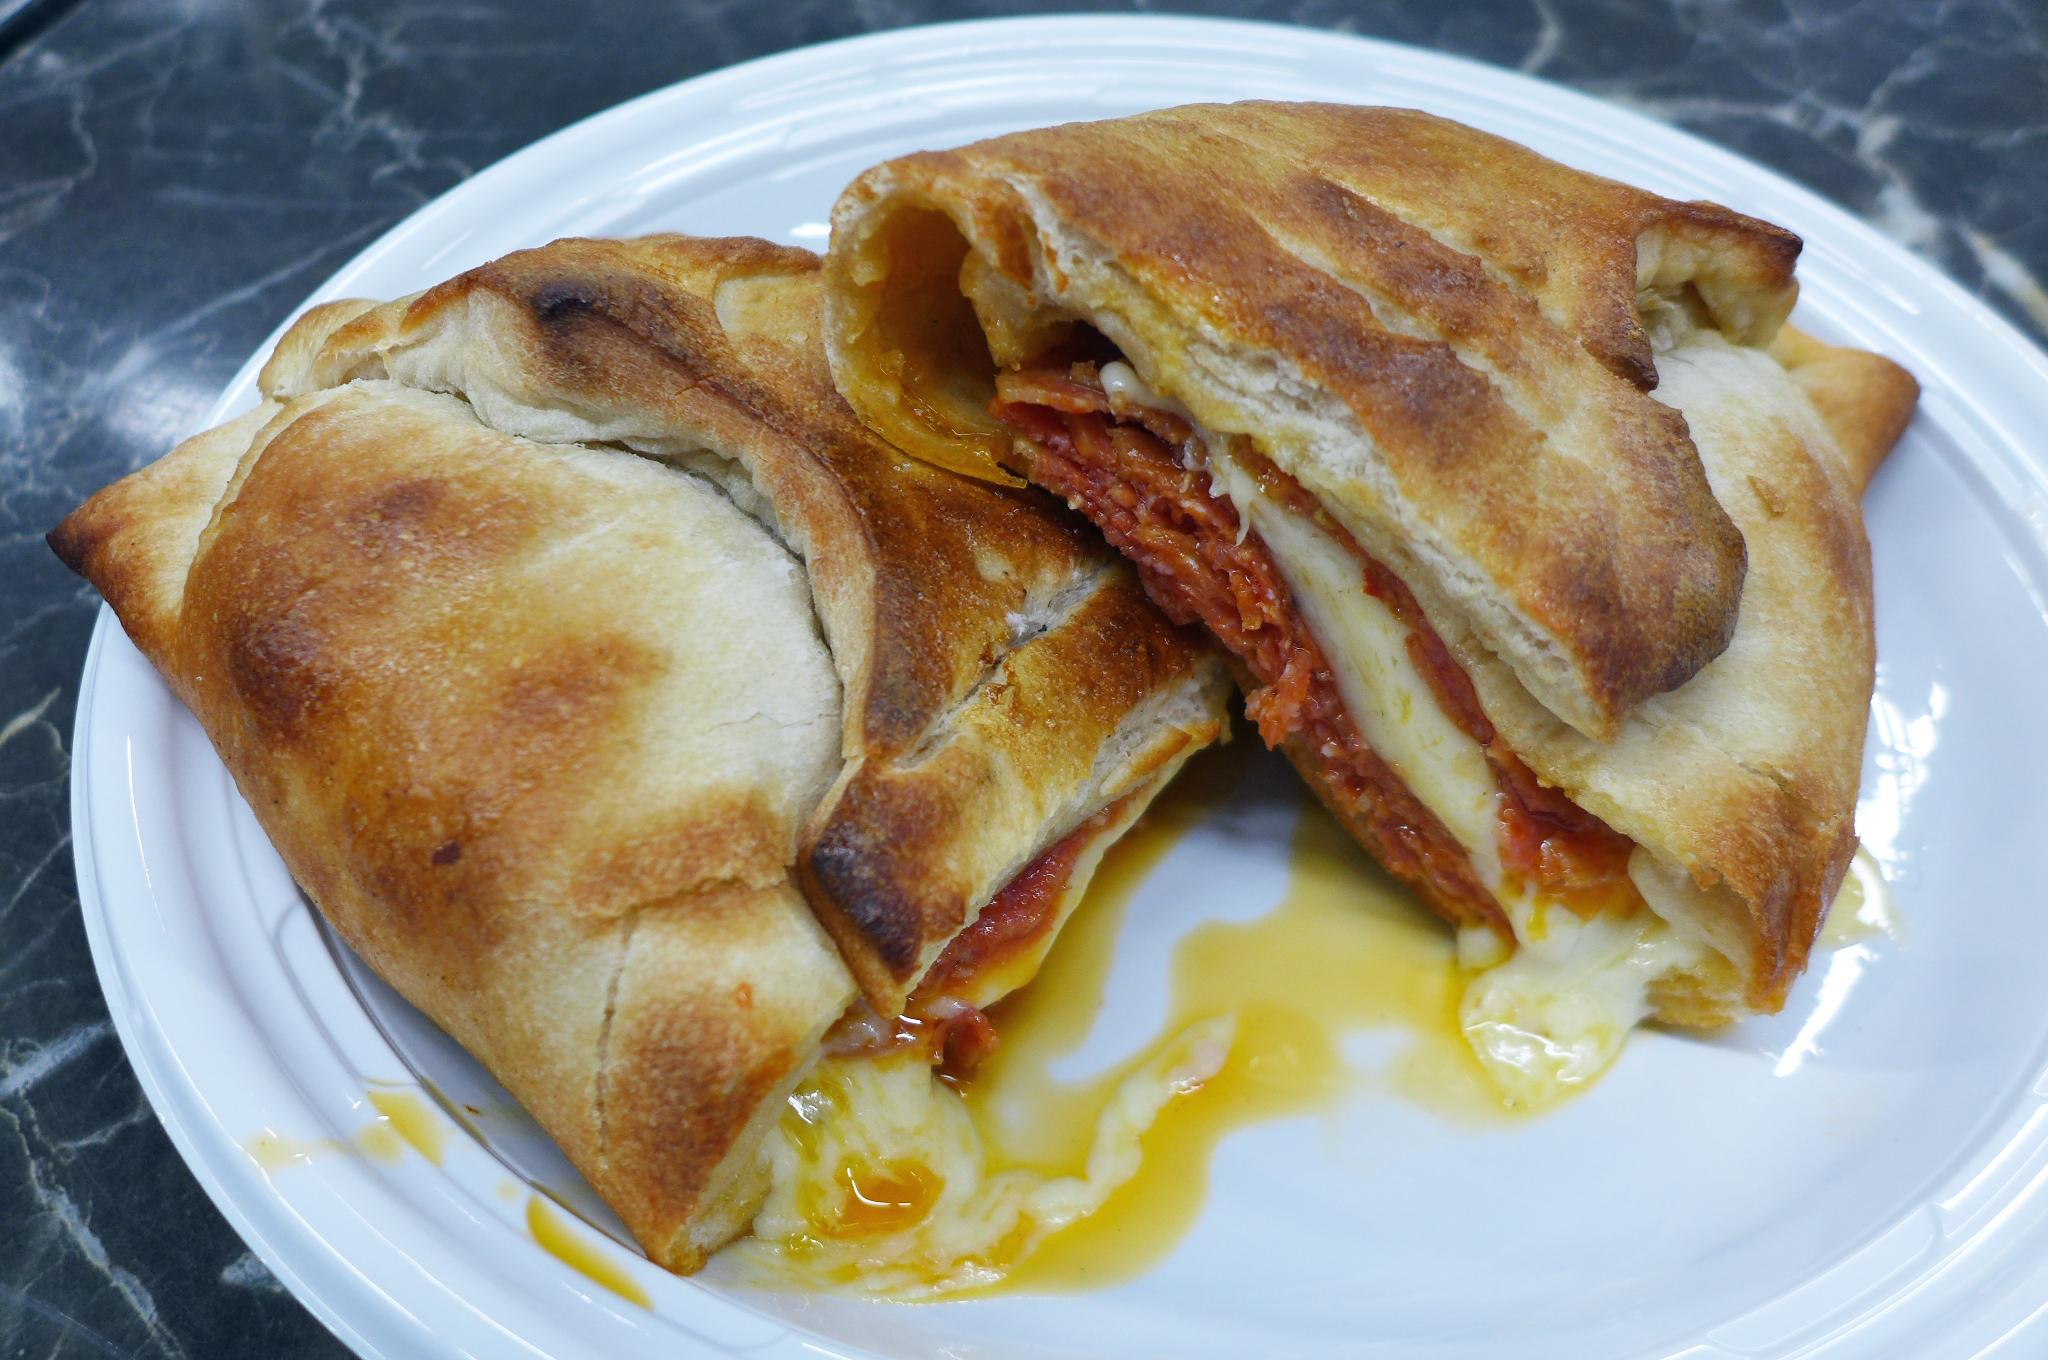 Best Restaurants Between Rd And  Upper East Side